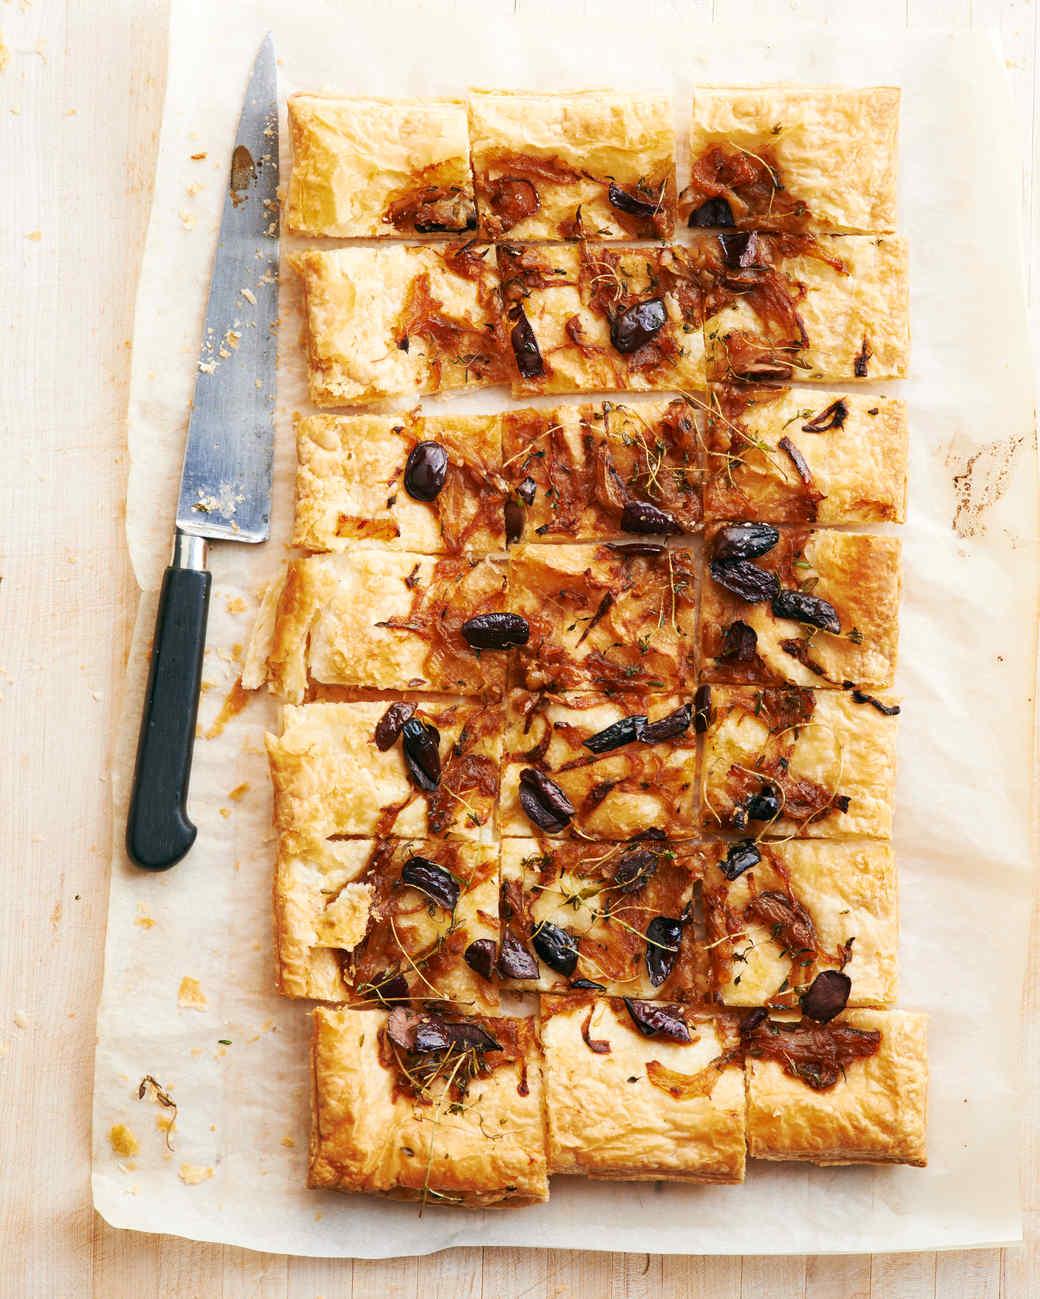 onion-olive-tart-0103-d111358-0815.jpg